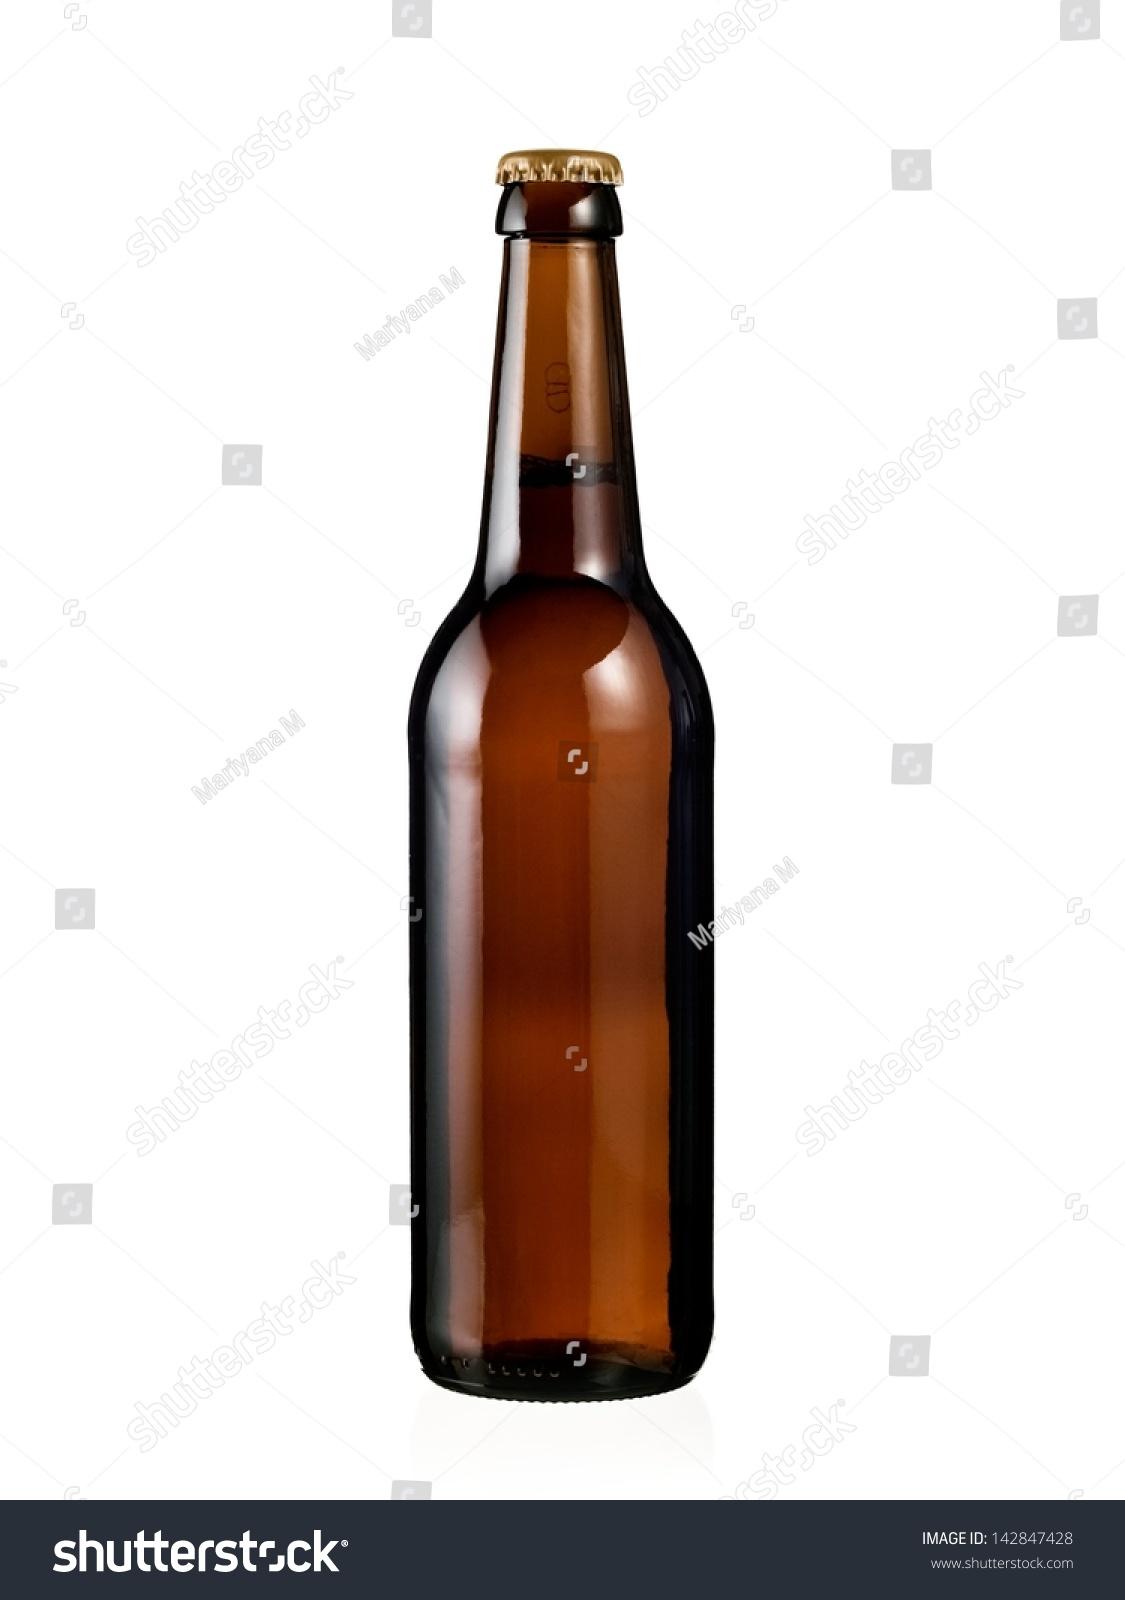 Full brown beer bottle #142847428